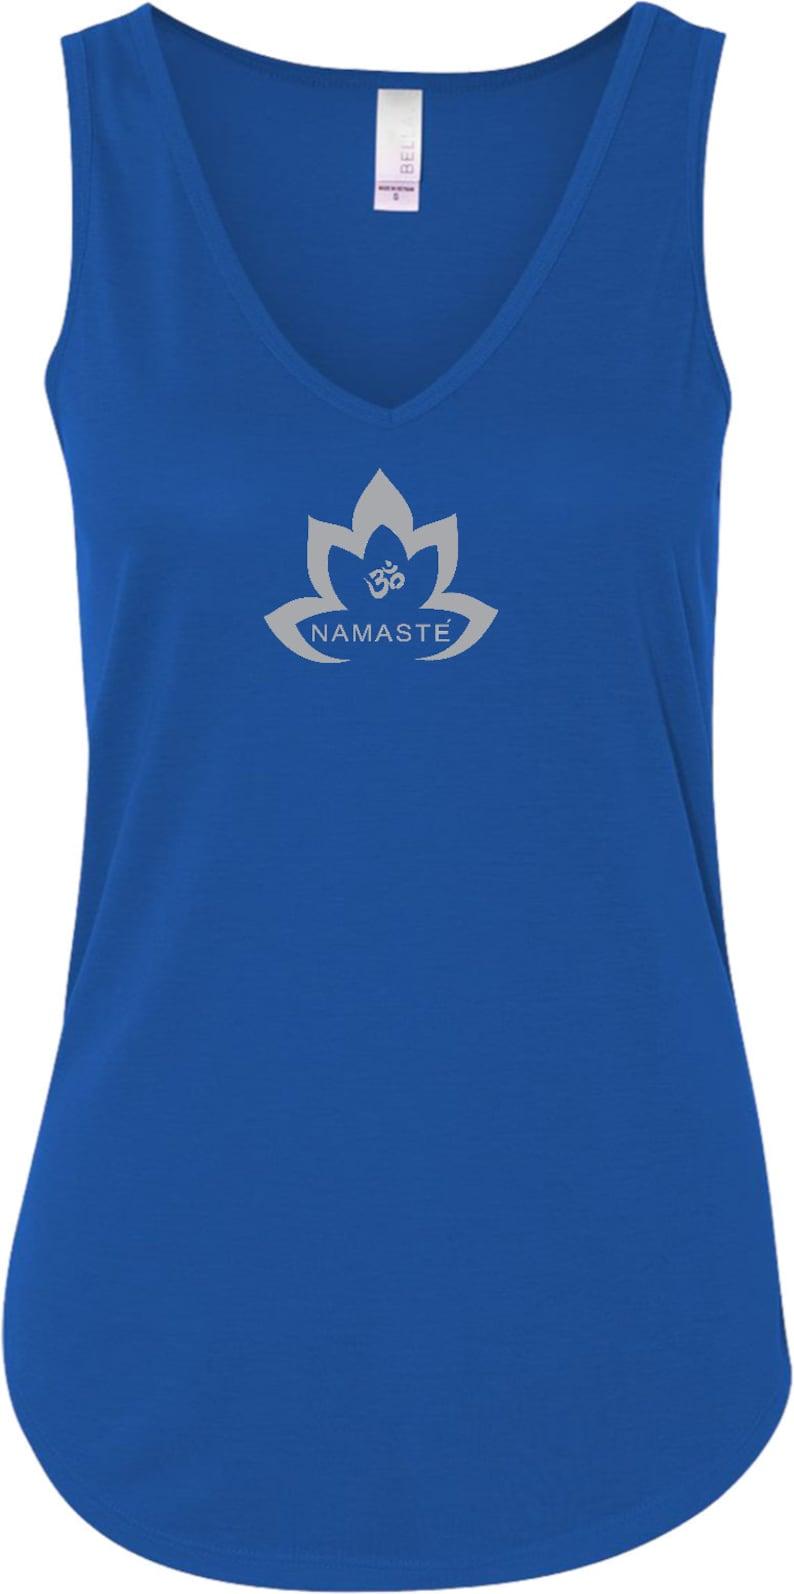 8cdd0b2cfb Grey Namaste Lotus Ladies Yoga Flowy V-Neck Tank Top | Etsy